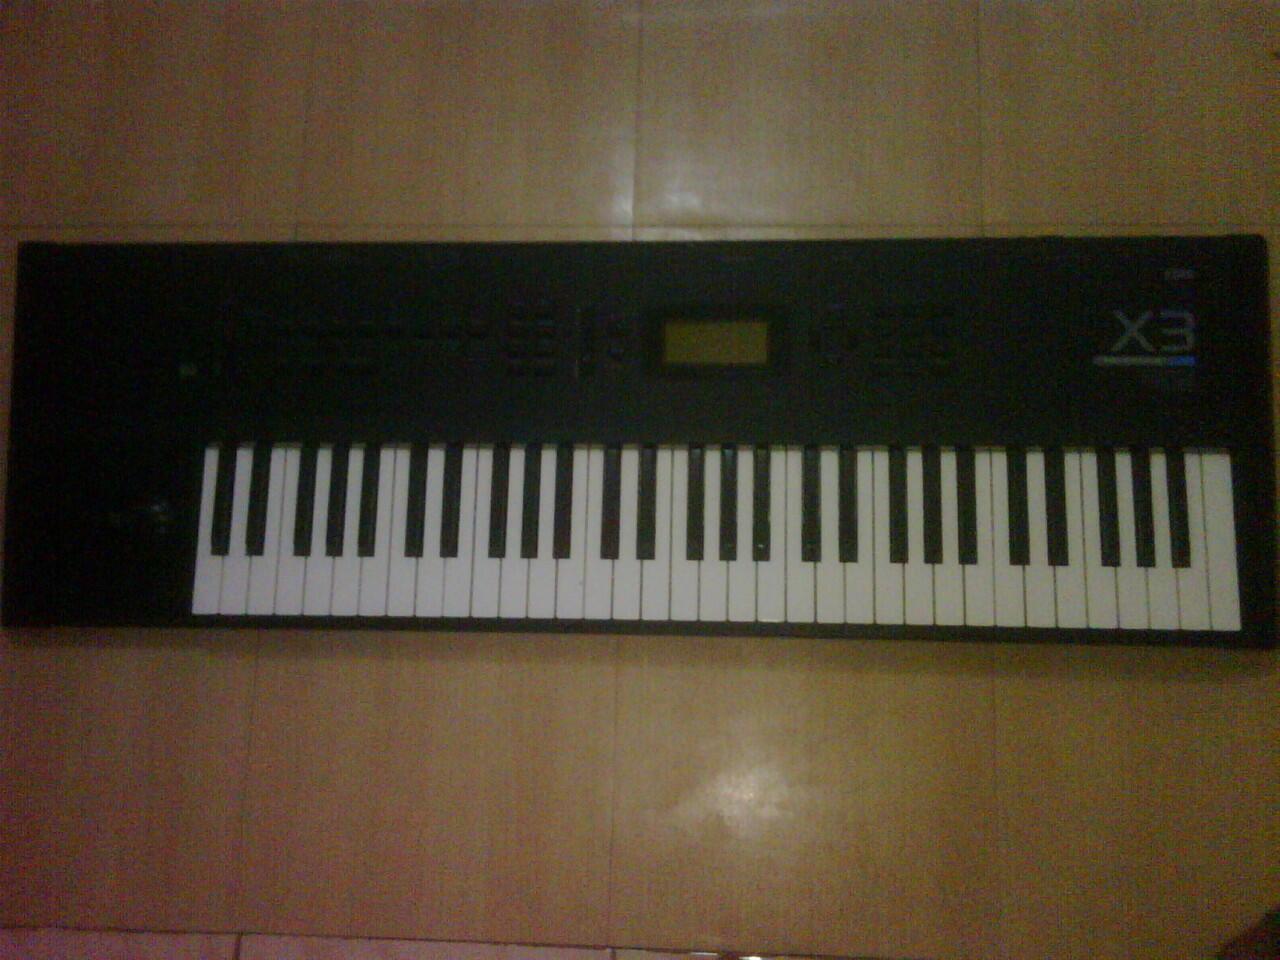 jual keyboard KORG X3 dan preamp behringer t1952